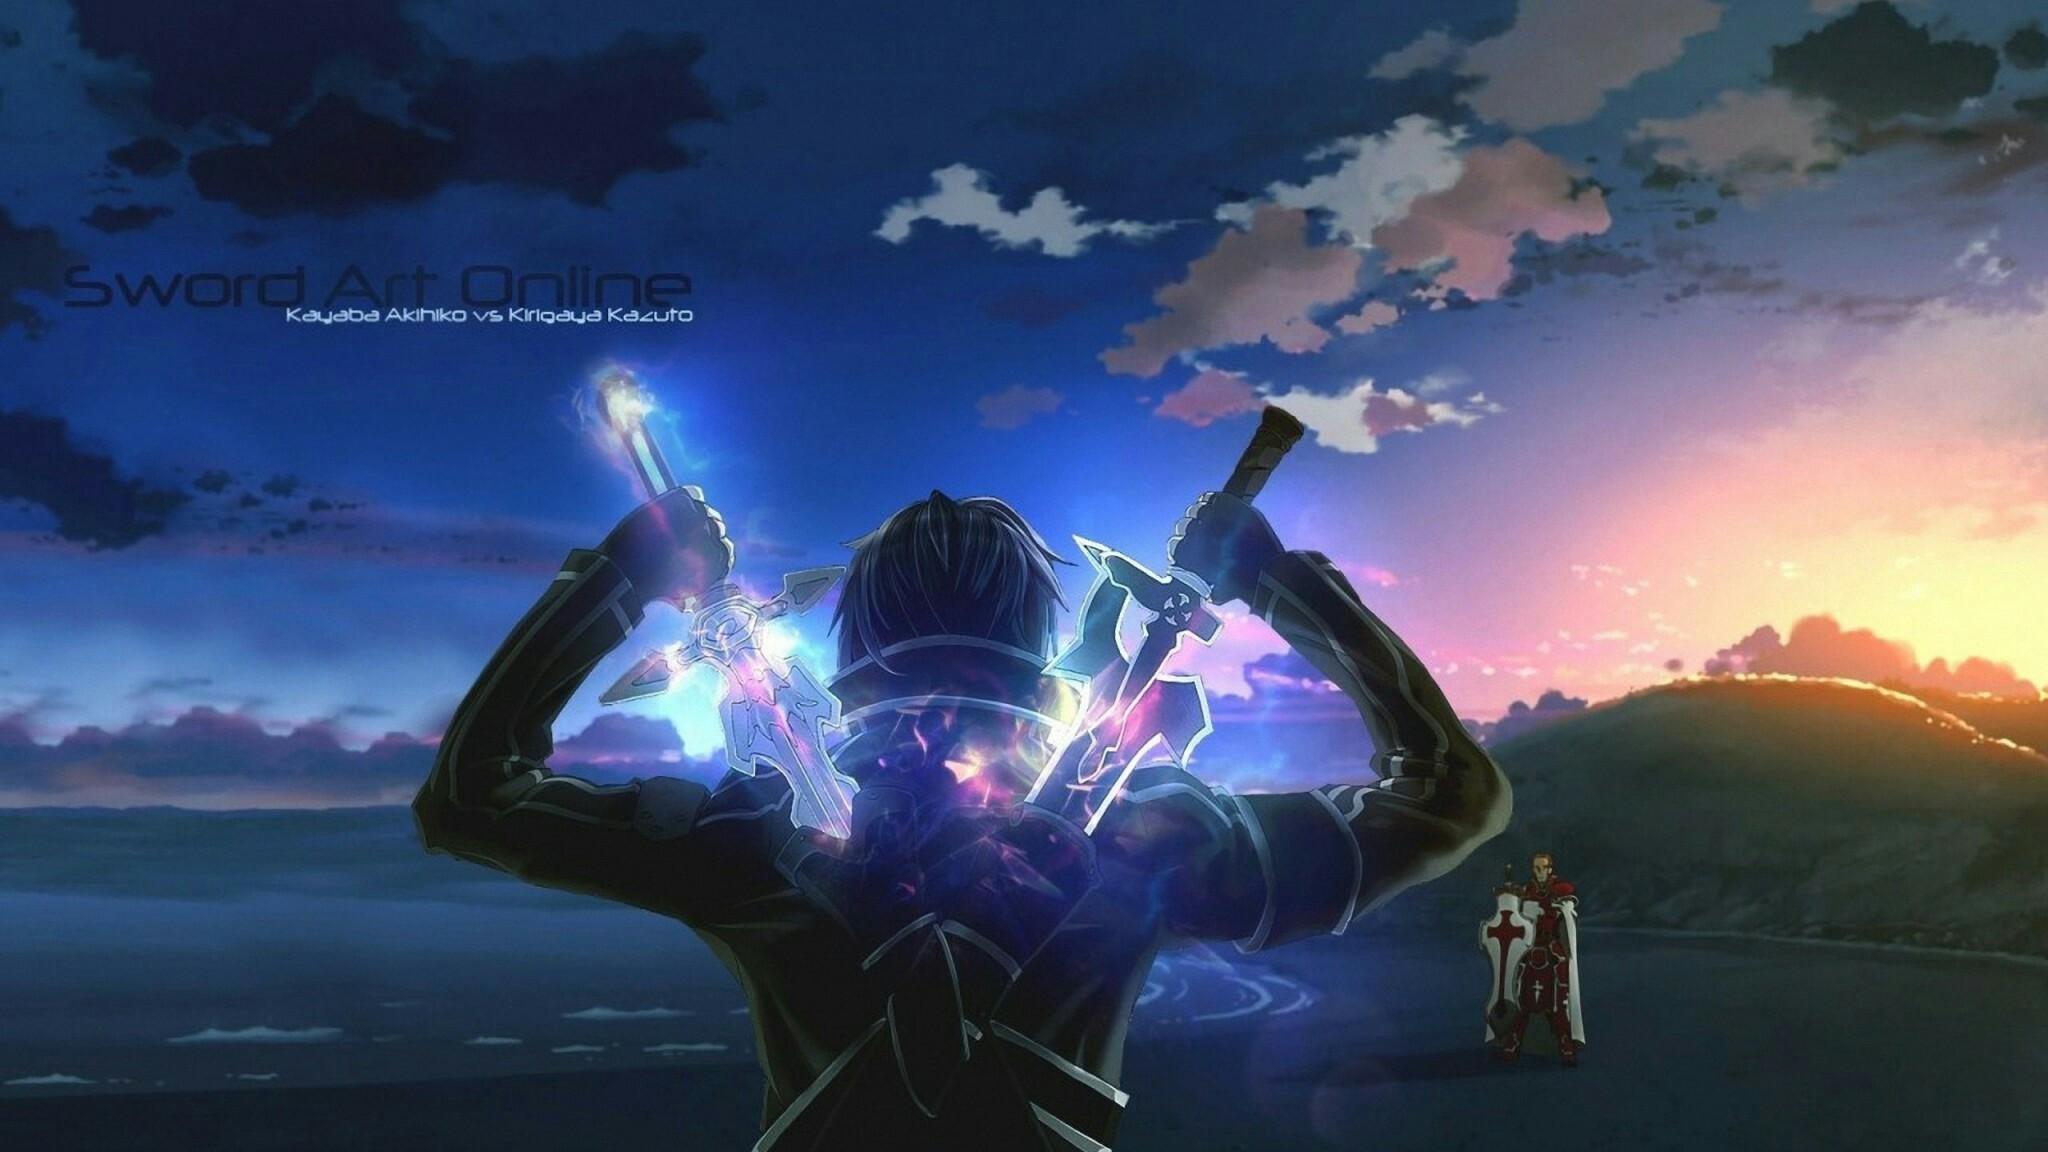 Sword Art Online Wallpaper, Iphone Wallpaper, Finals, Projects